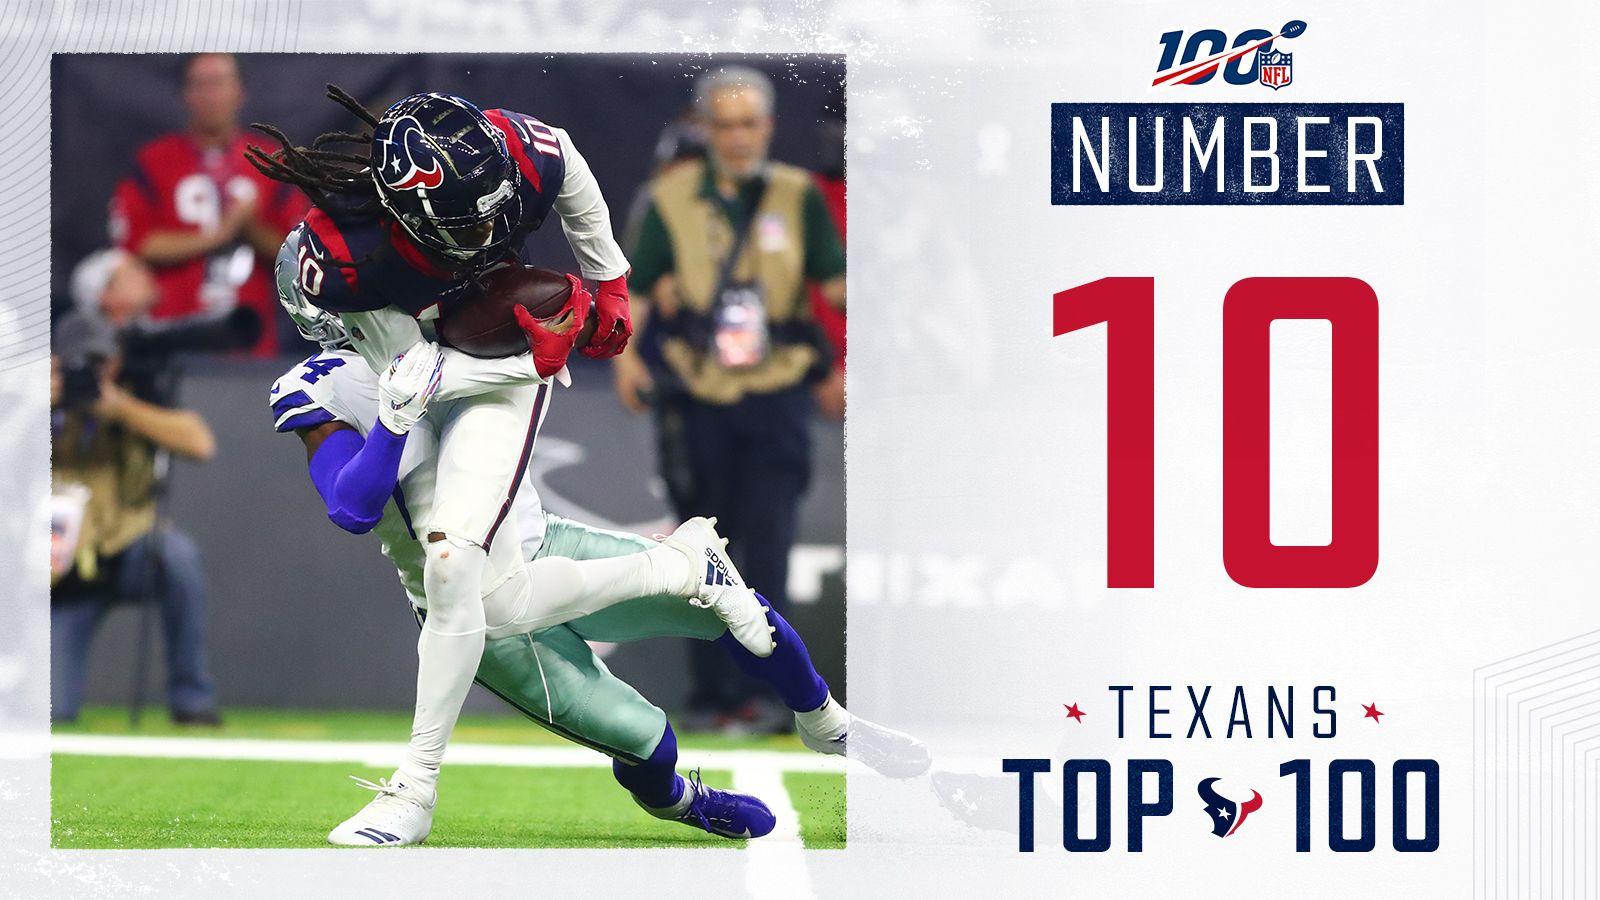 10_Hopspins vs Dallas in 2018 - TWITTER